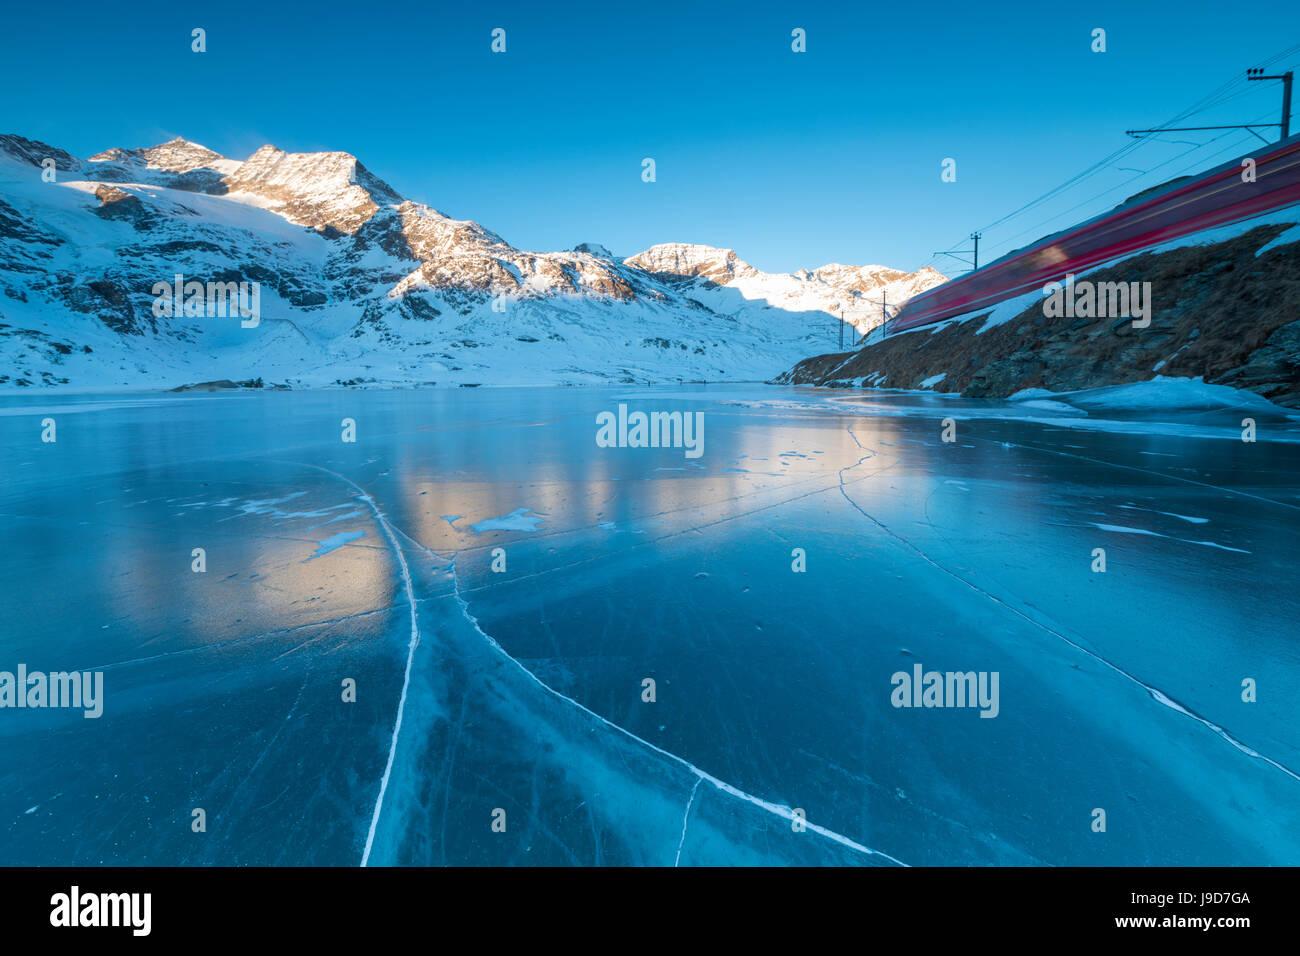 El Bernina Express tren funciona junto al lago congelado Bianco, Bernina Pass, cantón de Graubunden, Engadin, Imagen De Stock